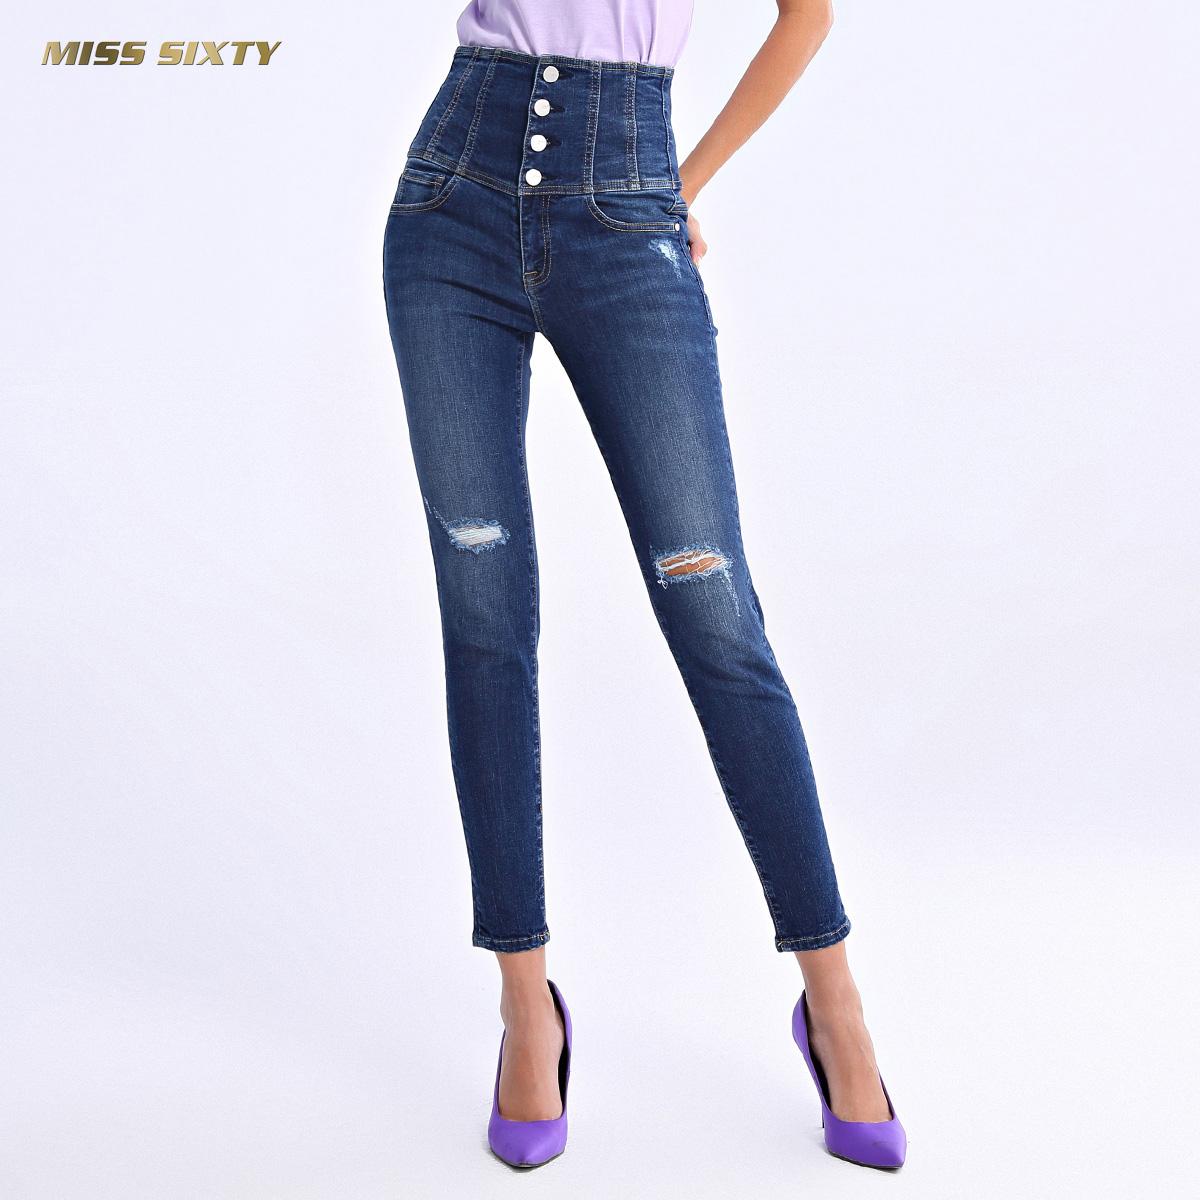 B Miss Sixty2018新款秋季紧身裤铅笔裤长裤破洞高腰牛仔裤女